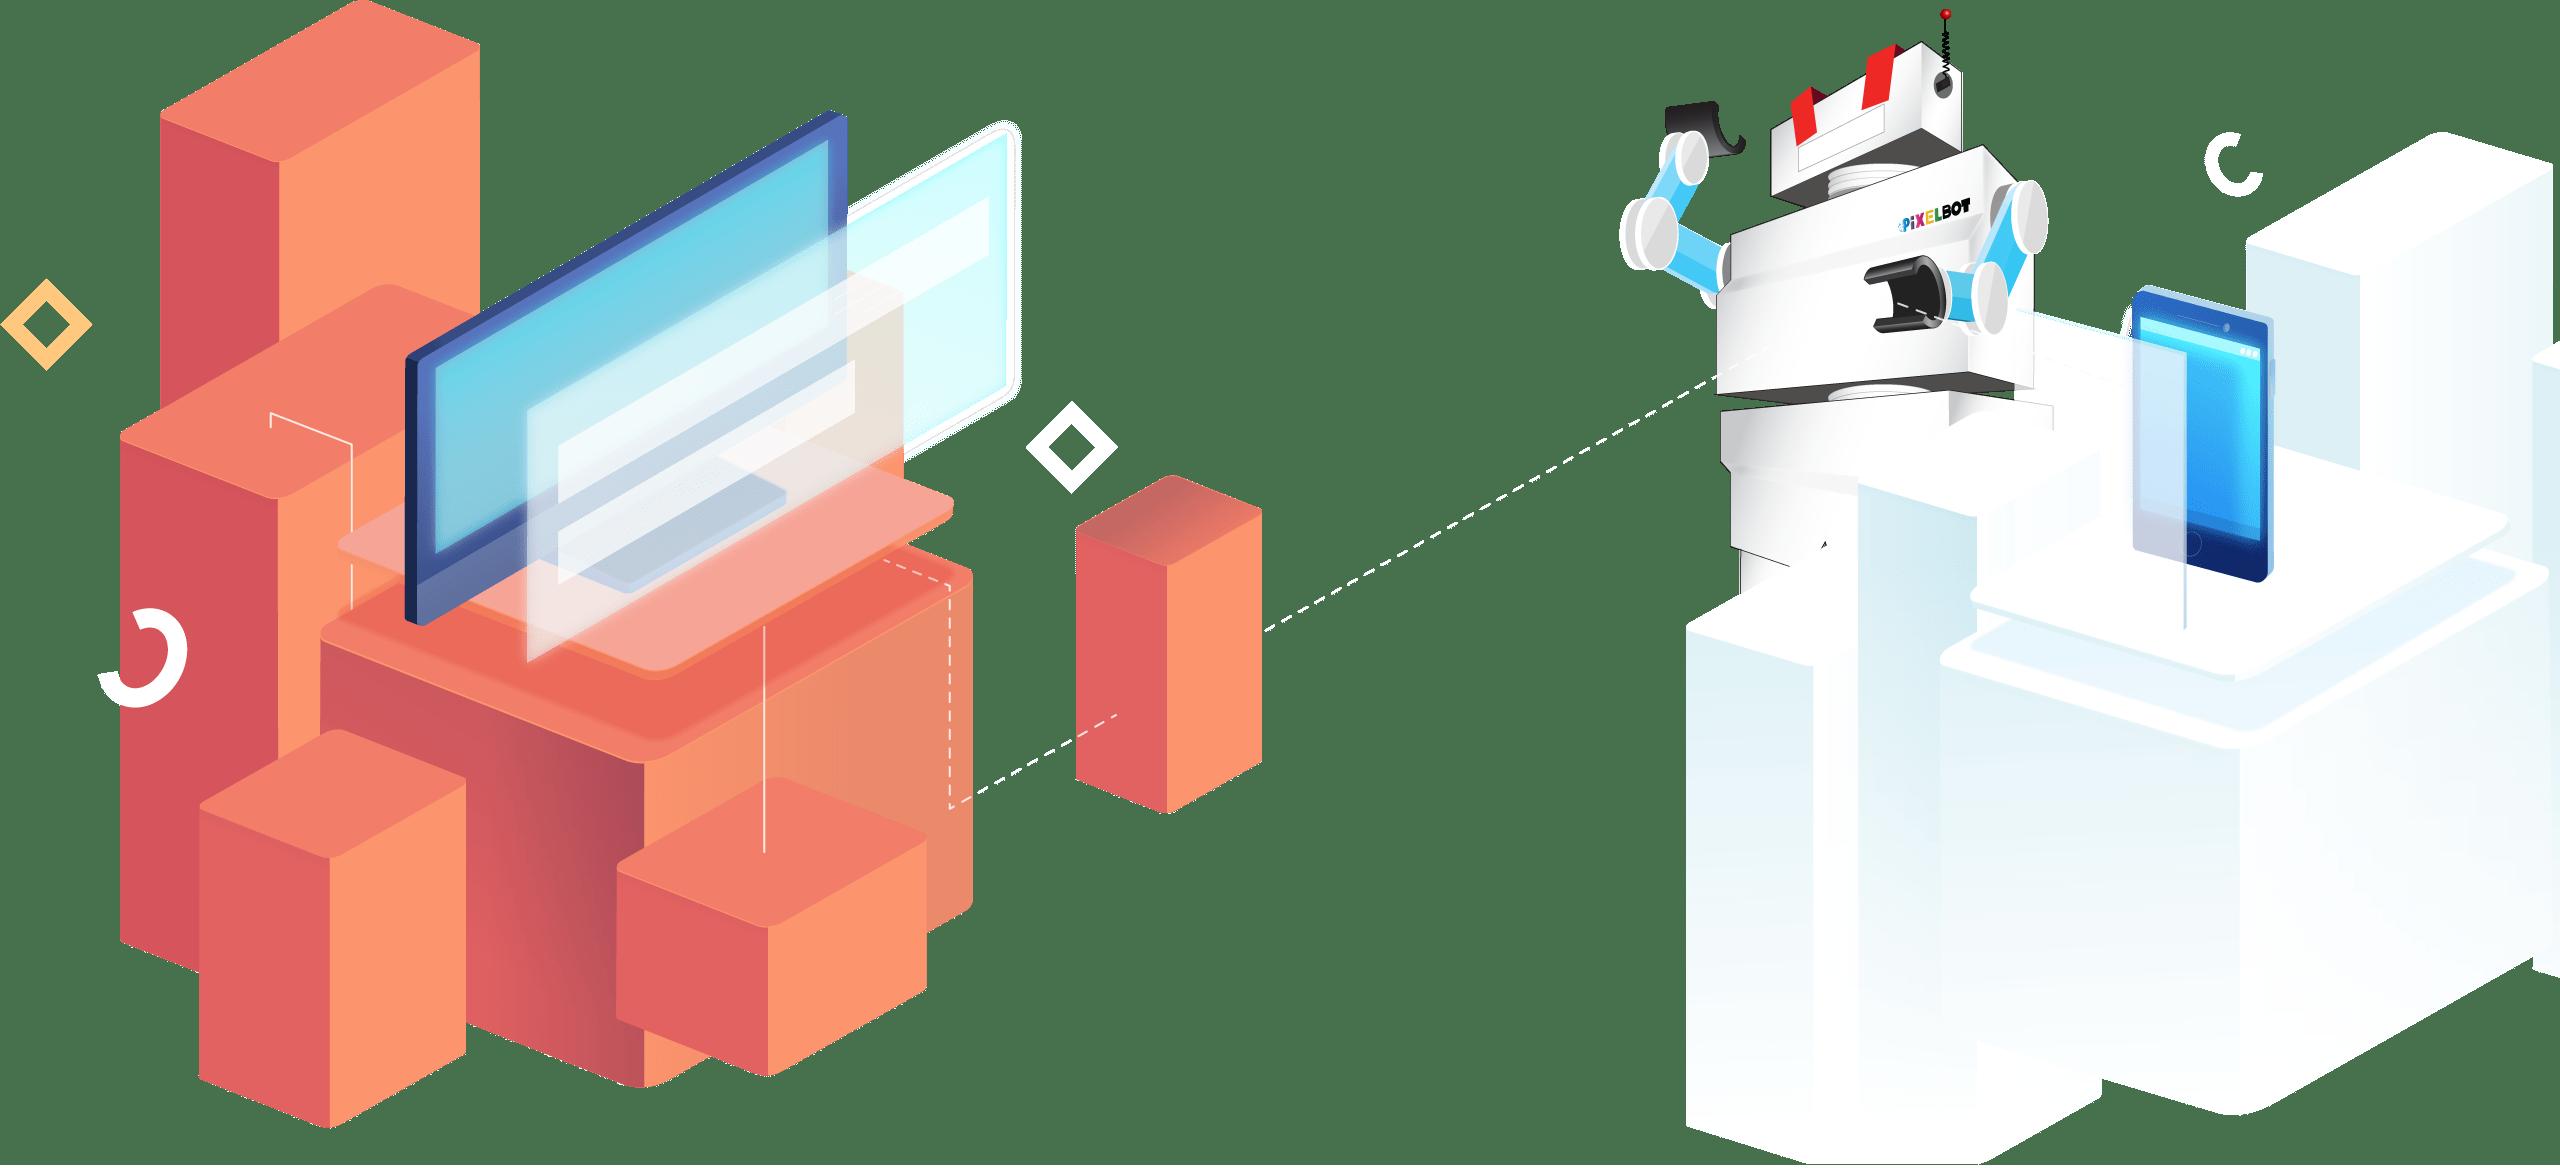 The Ventura Pixel, Web Design, SEO and Creative Design